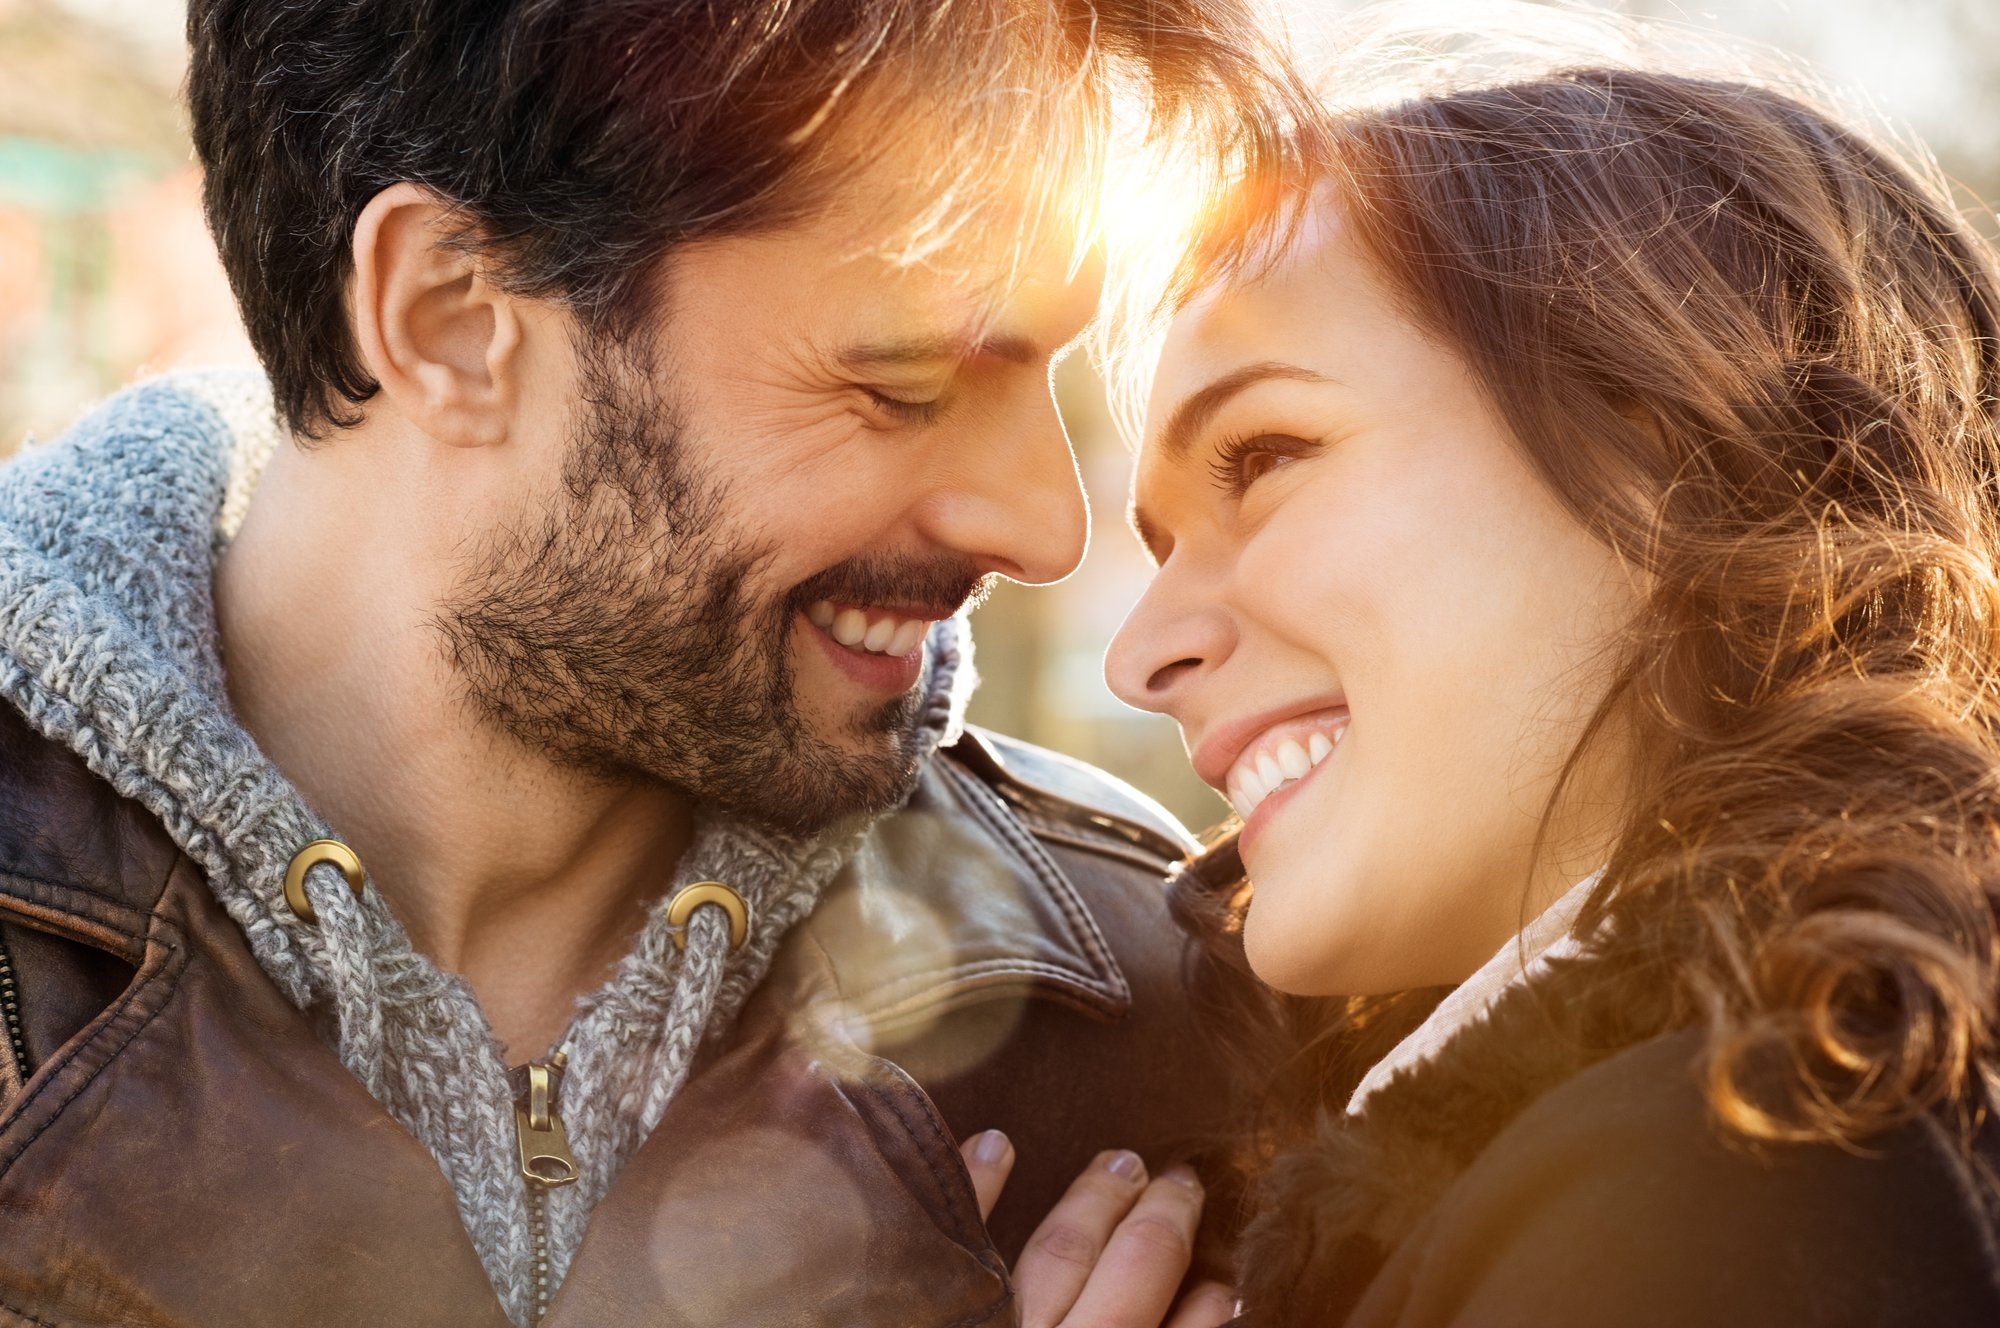 do relationships make us codependent?